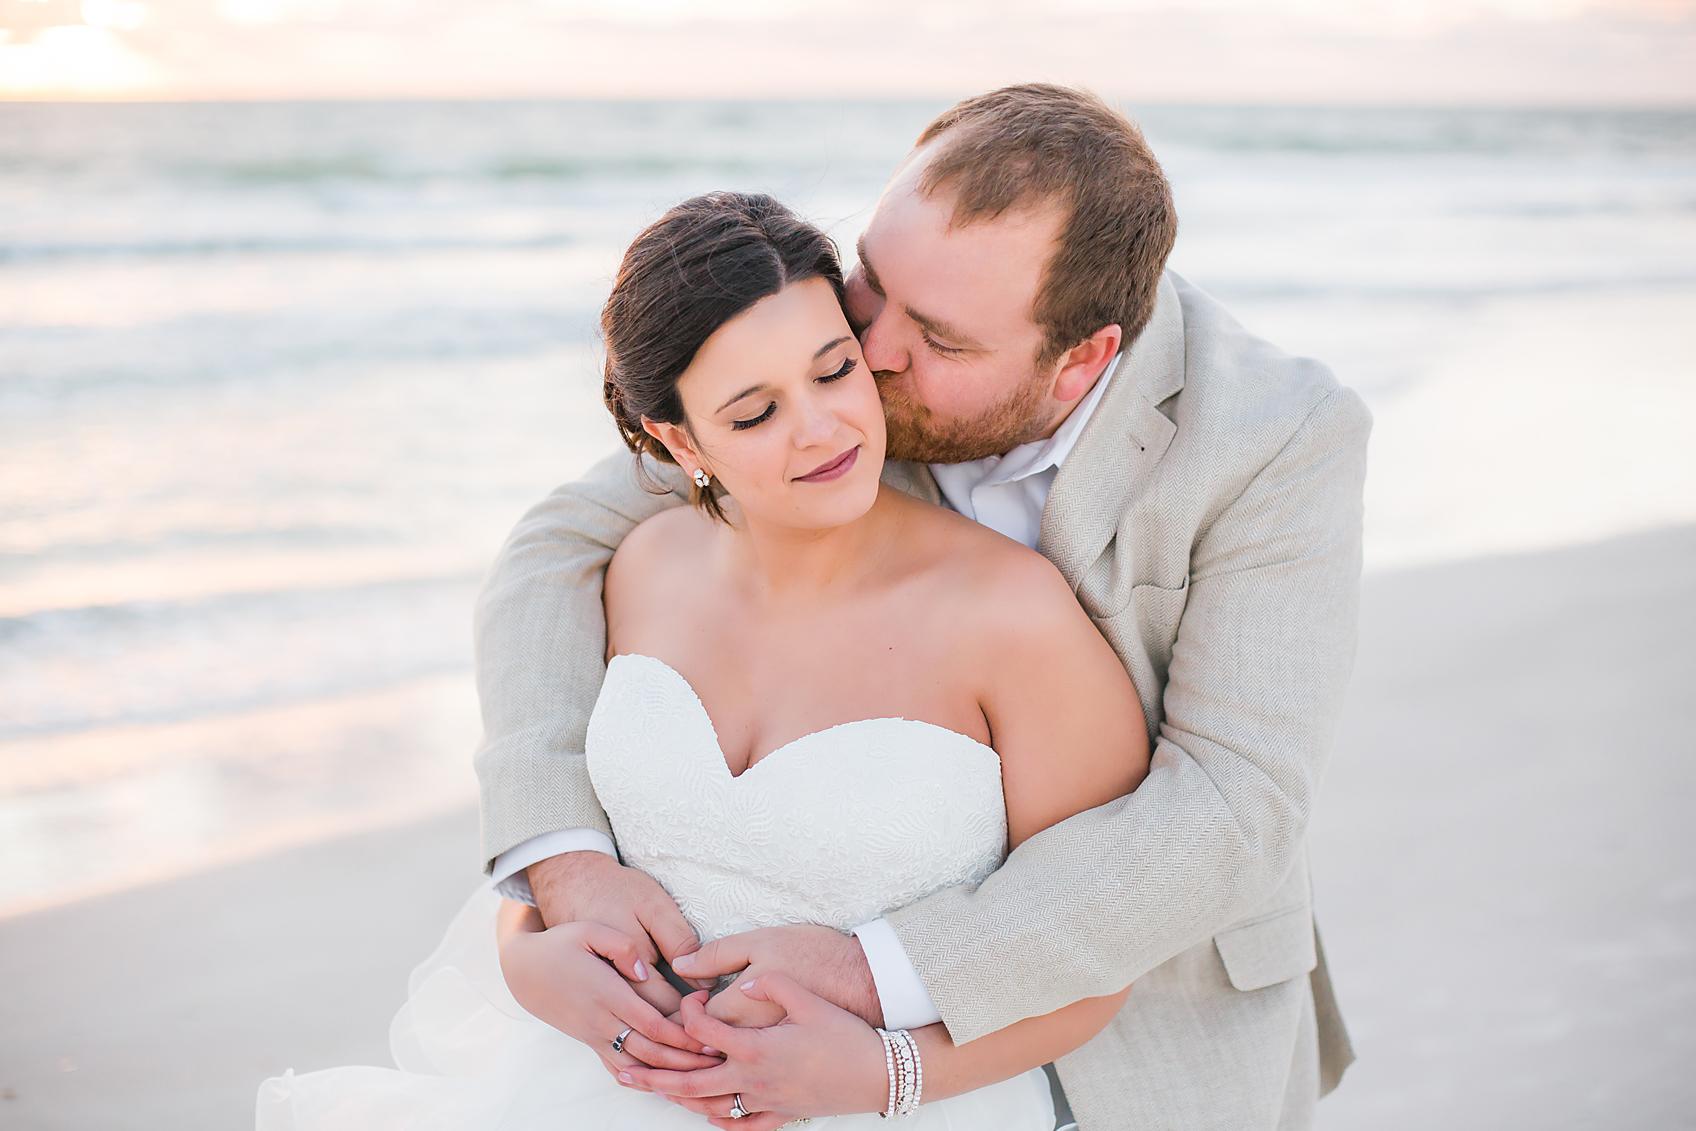 Bailey + Chalin - Anna Maria Island Wedding Photographer - Destination Wedding Photography - Emily & Co. Photography - Beach Wedding Photography 192.jpg